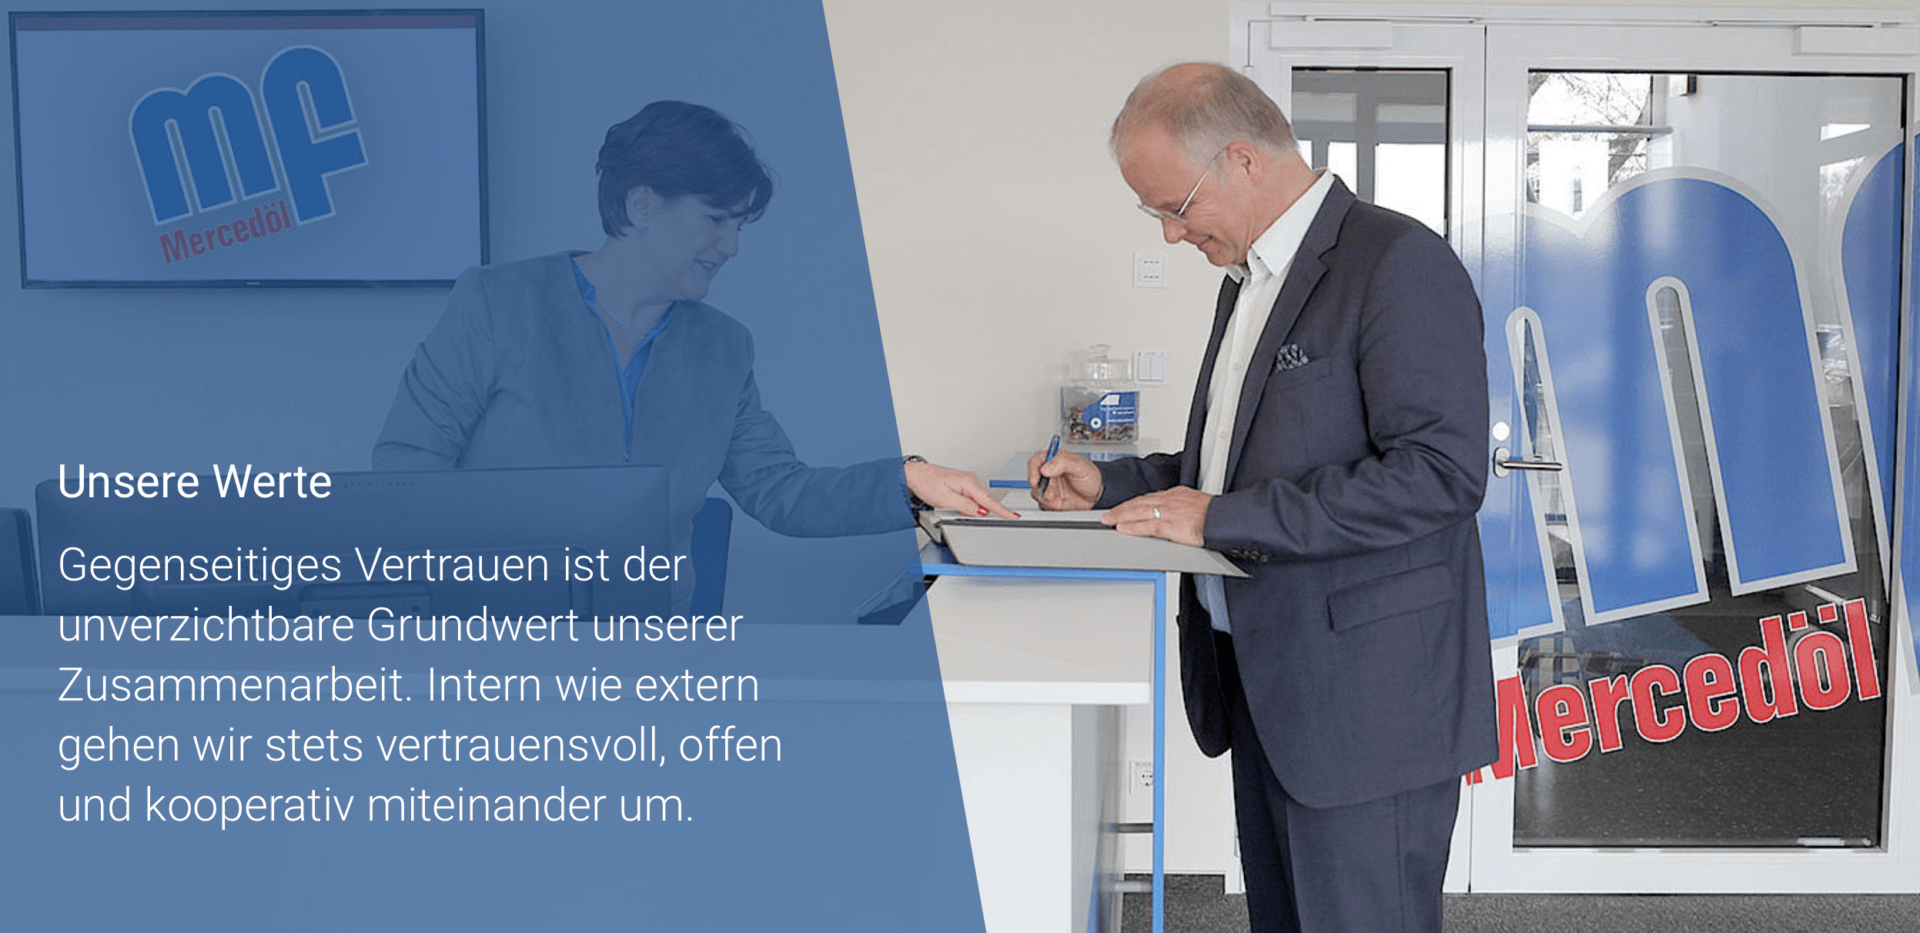 mf Mercedöl GmbH – Heizung, Sanitär, Zukunft in Berlin/Brandenburg